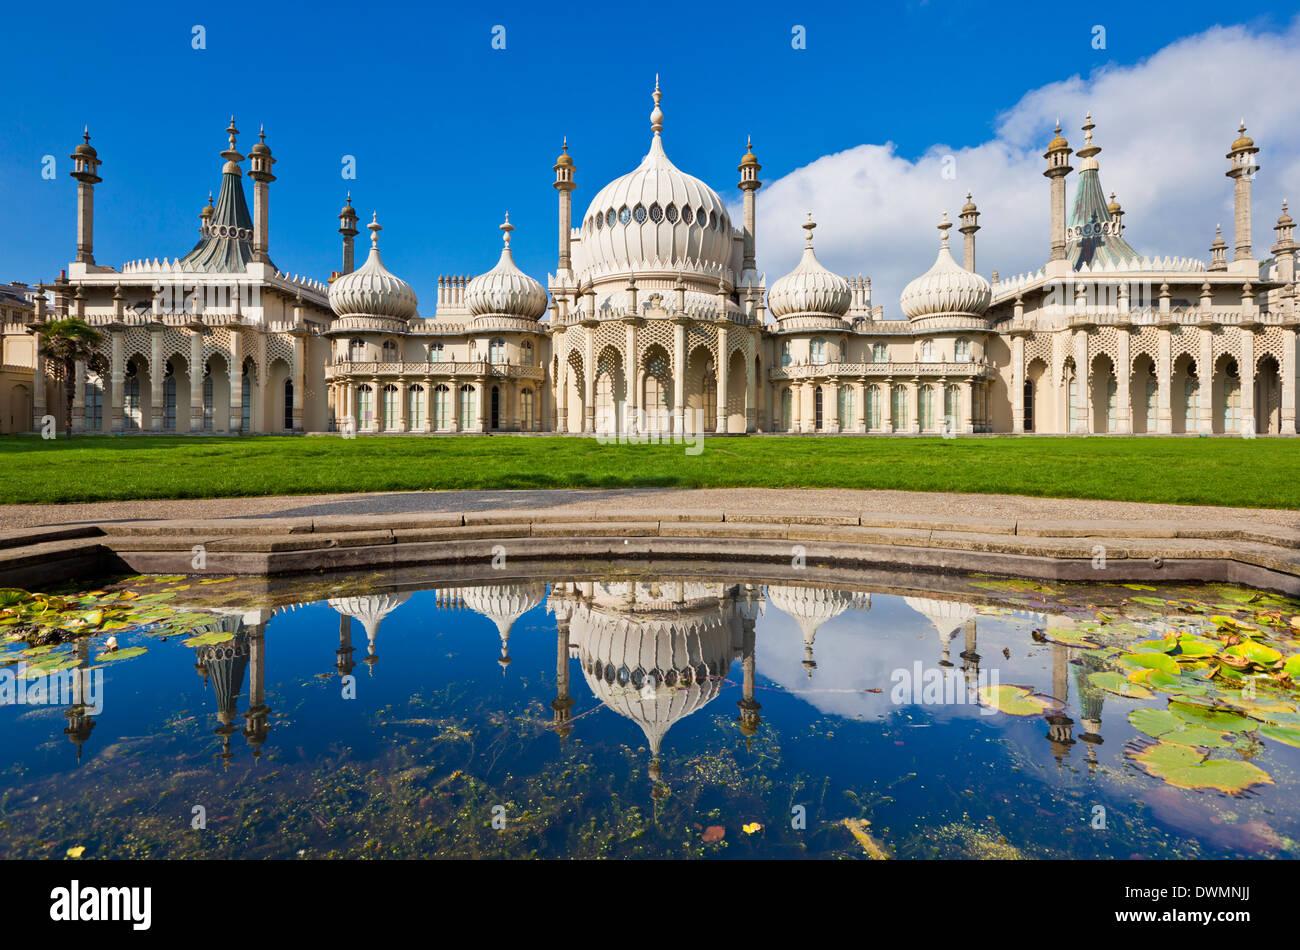 Brighton Royal Pavilion with reflection, Brighton, East Sussex, England, United Kingdom, Europe - Stock Image